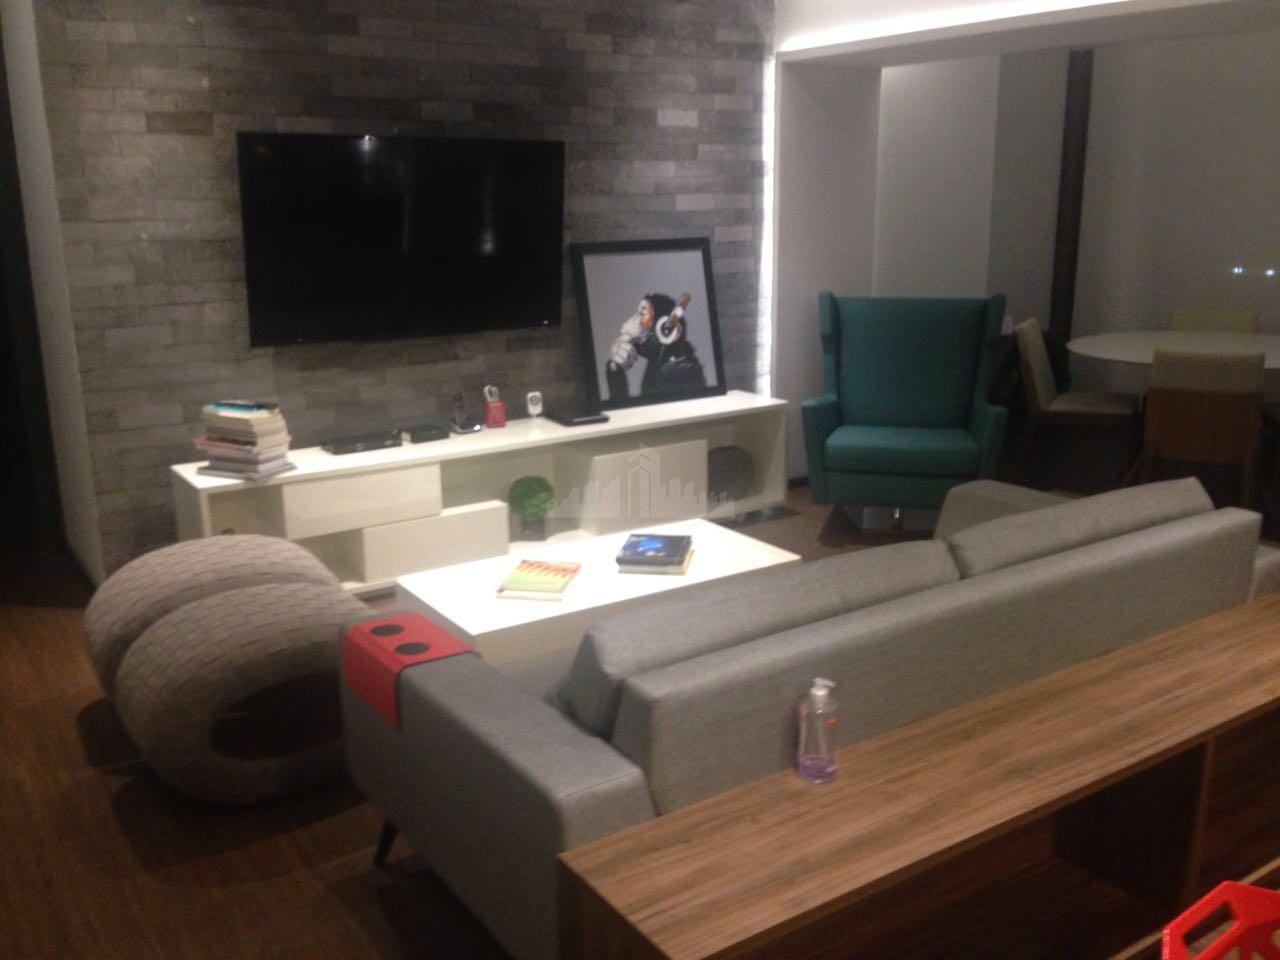 Apartamento com 89m² 2 dormitórios 1 suíte 2 vagas no Campo Belo